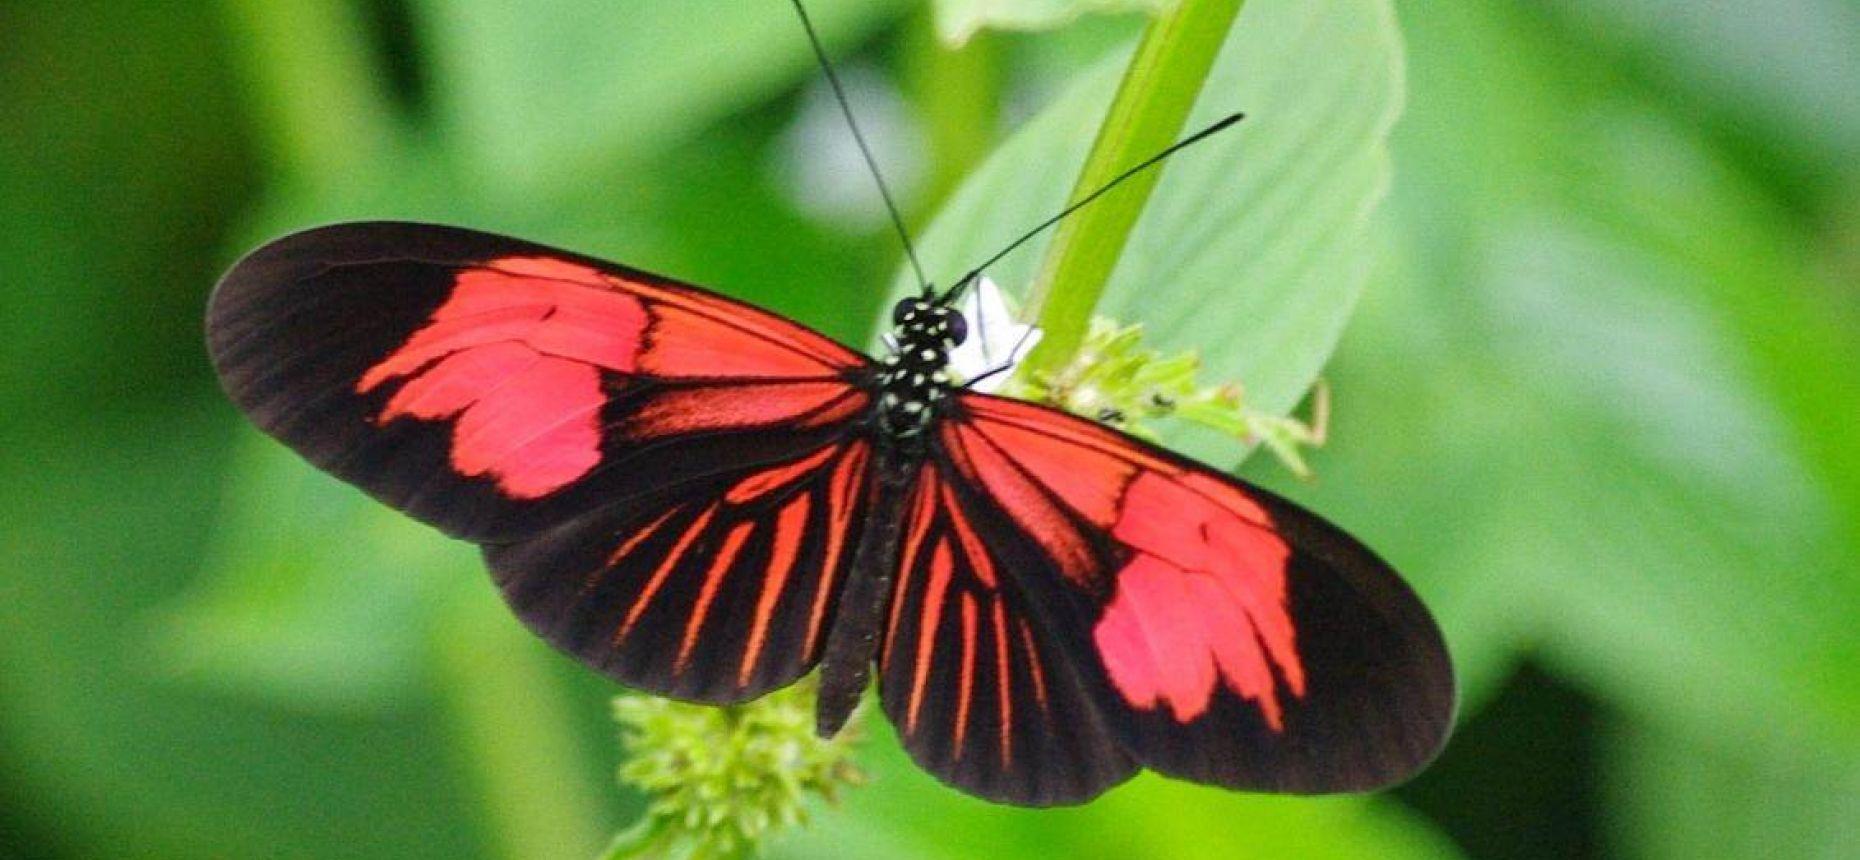 Бабочки и природа